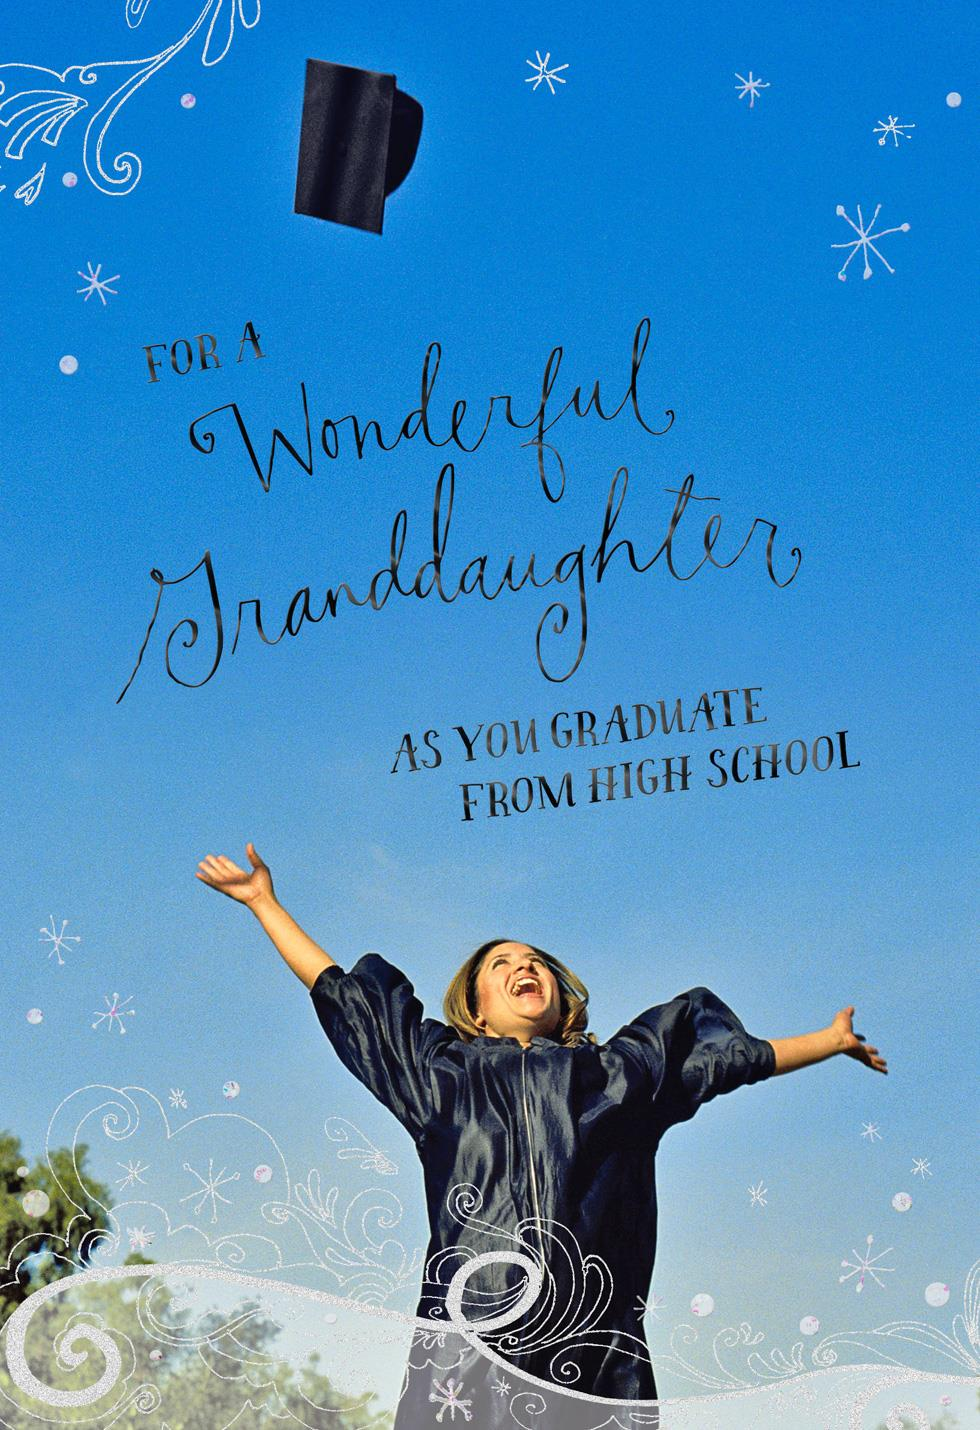 Full of Promise High School Graduation Card for Granddaughter